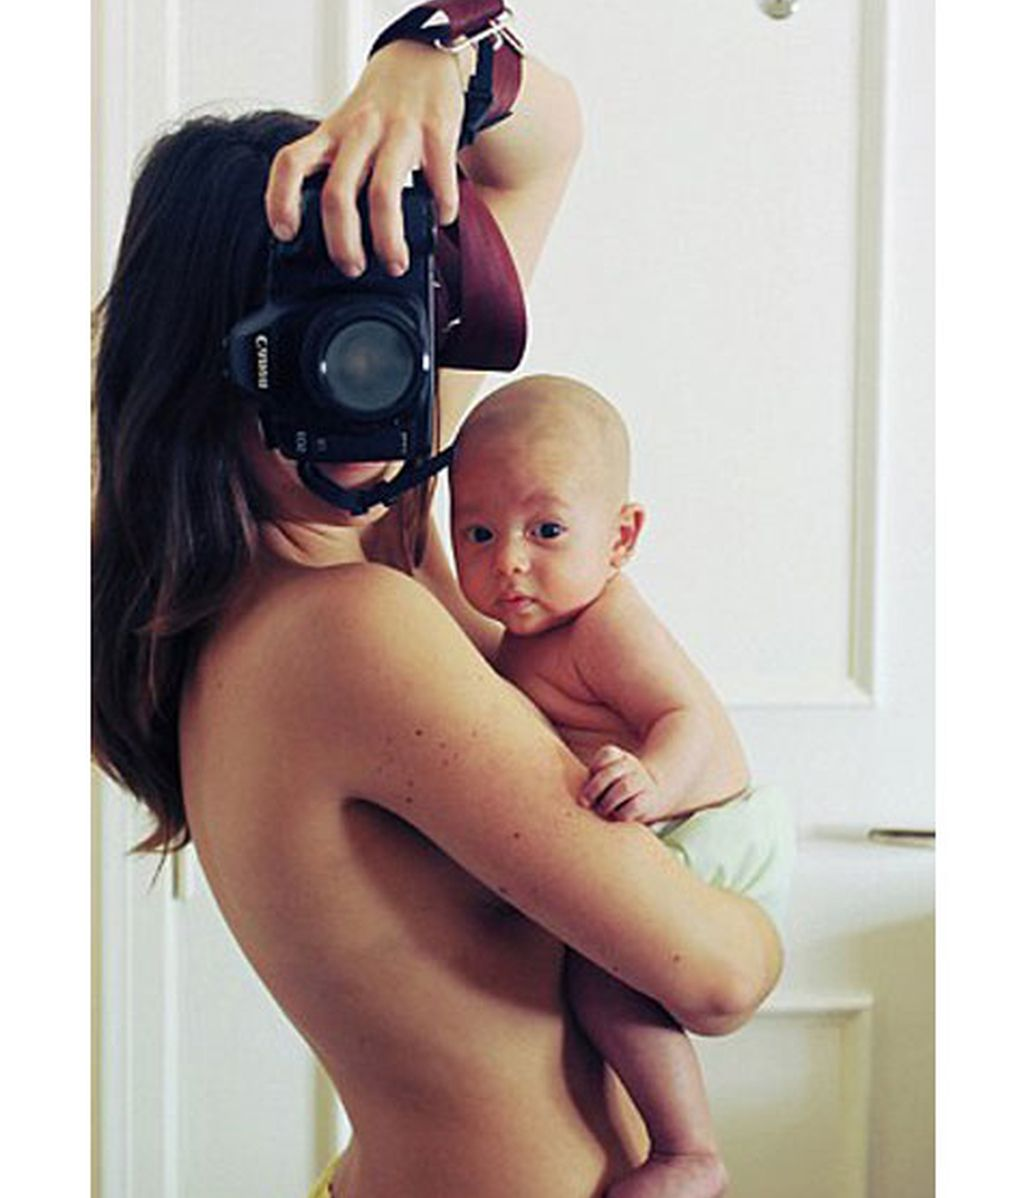 Una fotógrafa argentina 'captura' su embarazo